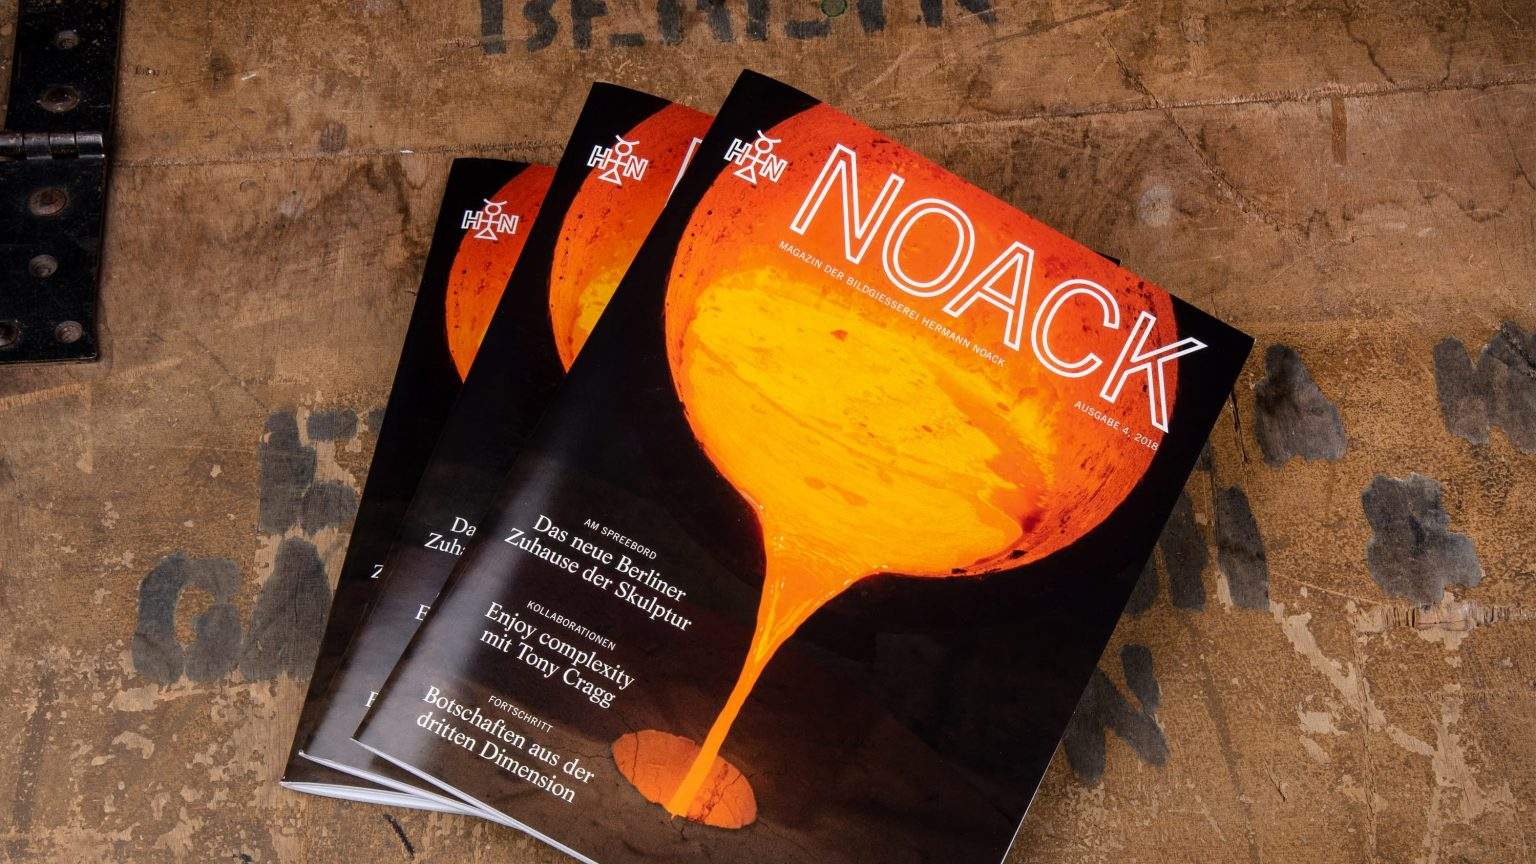 Ta Trung Noack Magazin 24